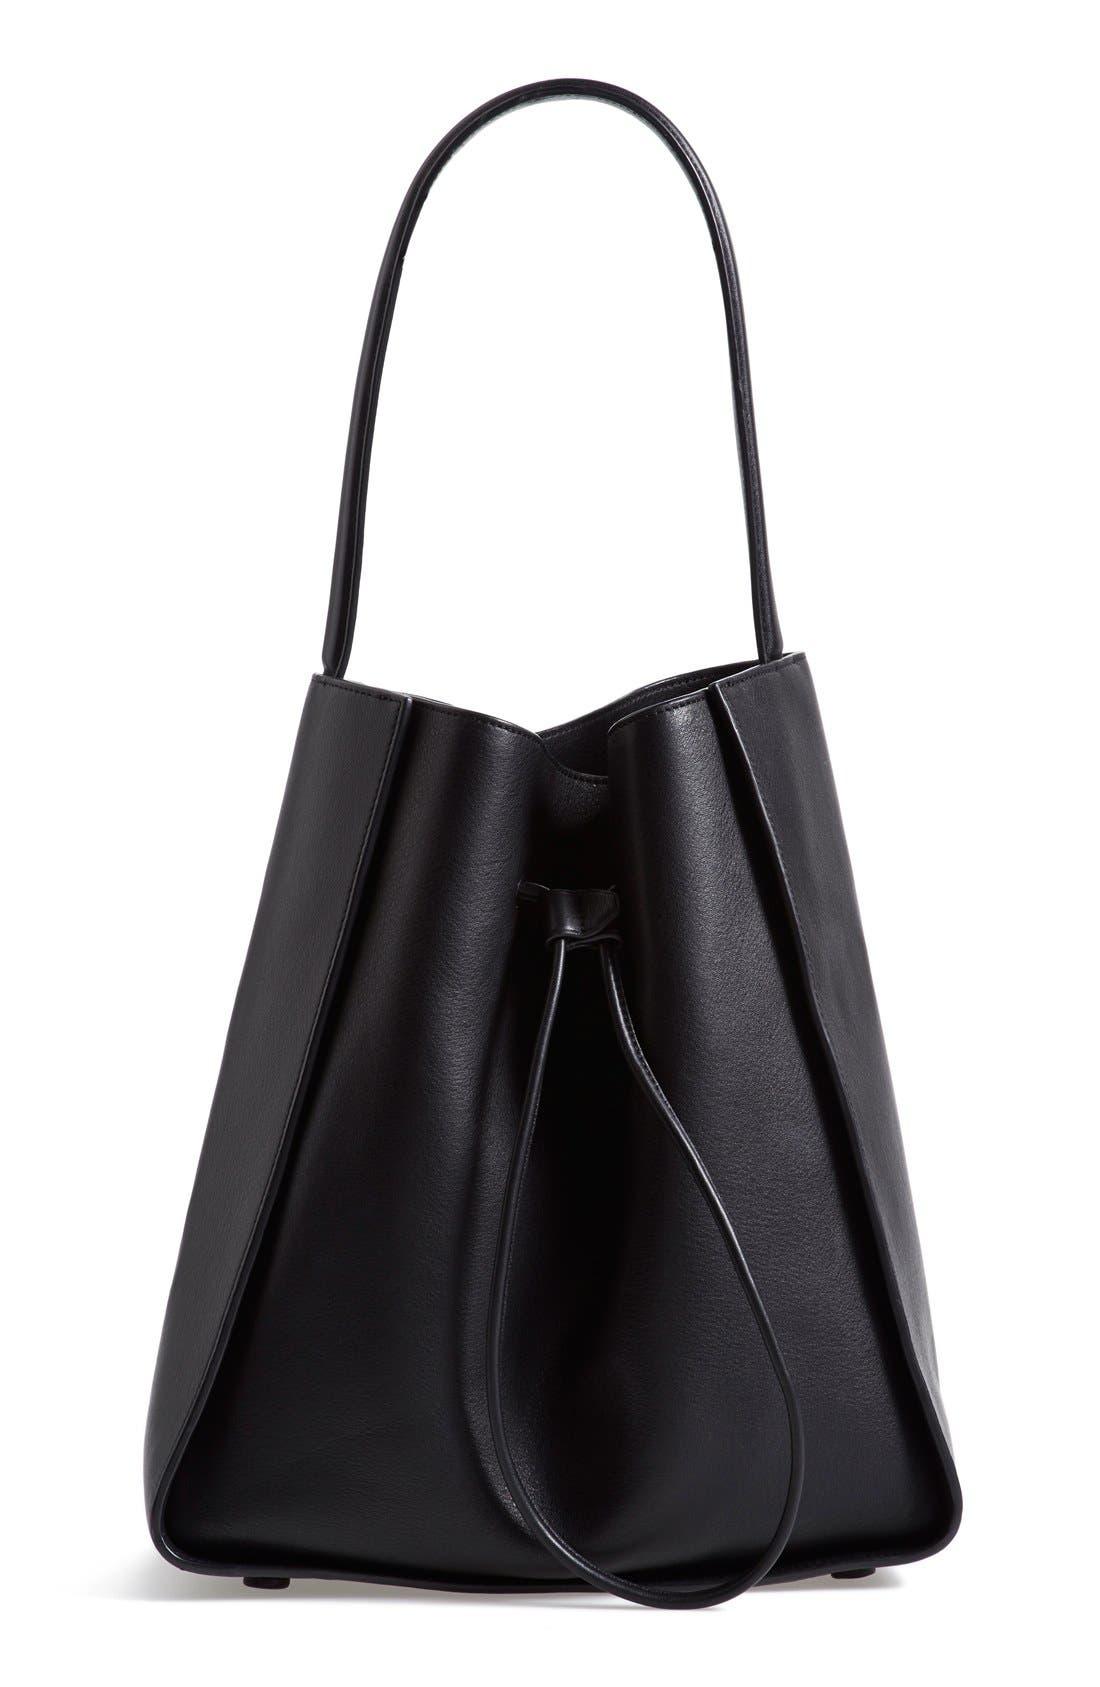 Alternate Image 1 Selected - 3.1 Phillip Lim 'Large Soleil' Leather Bucket Bag